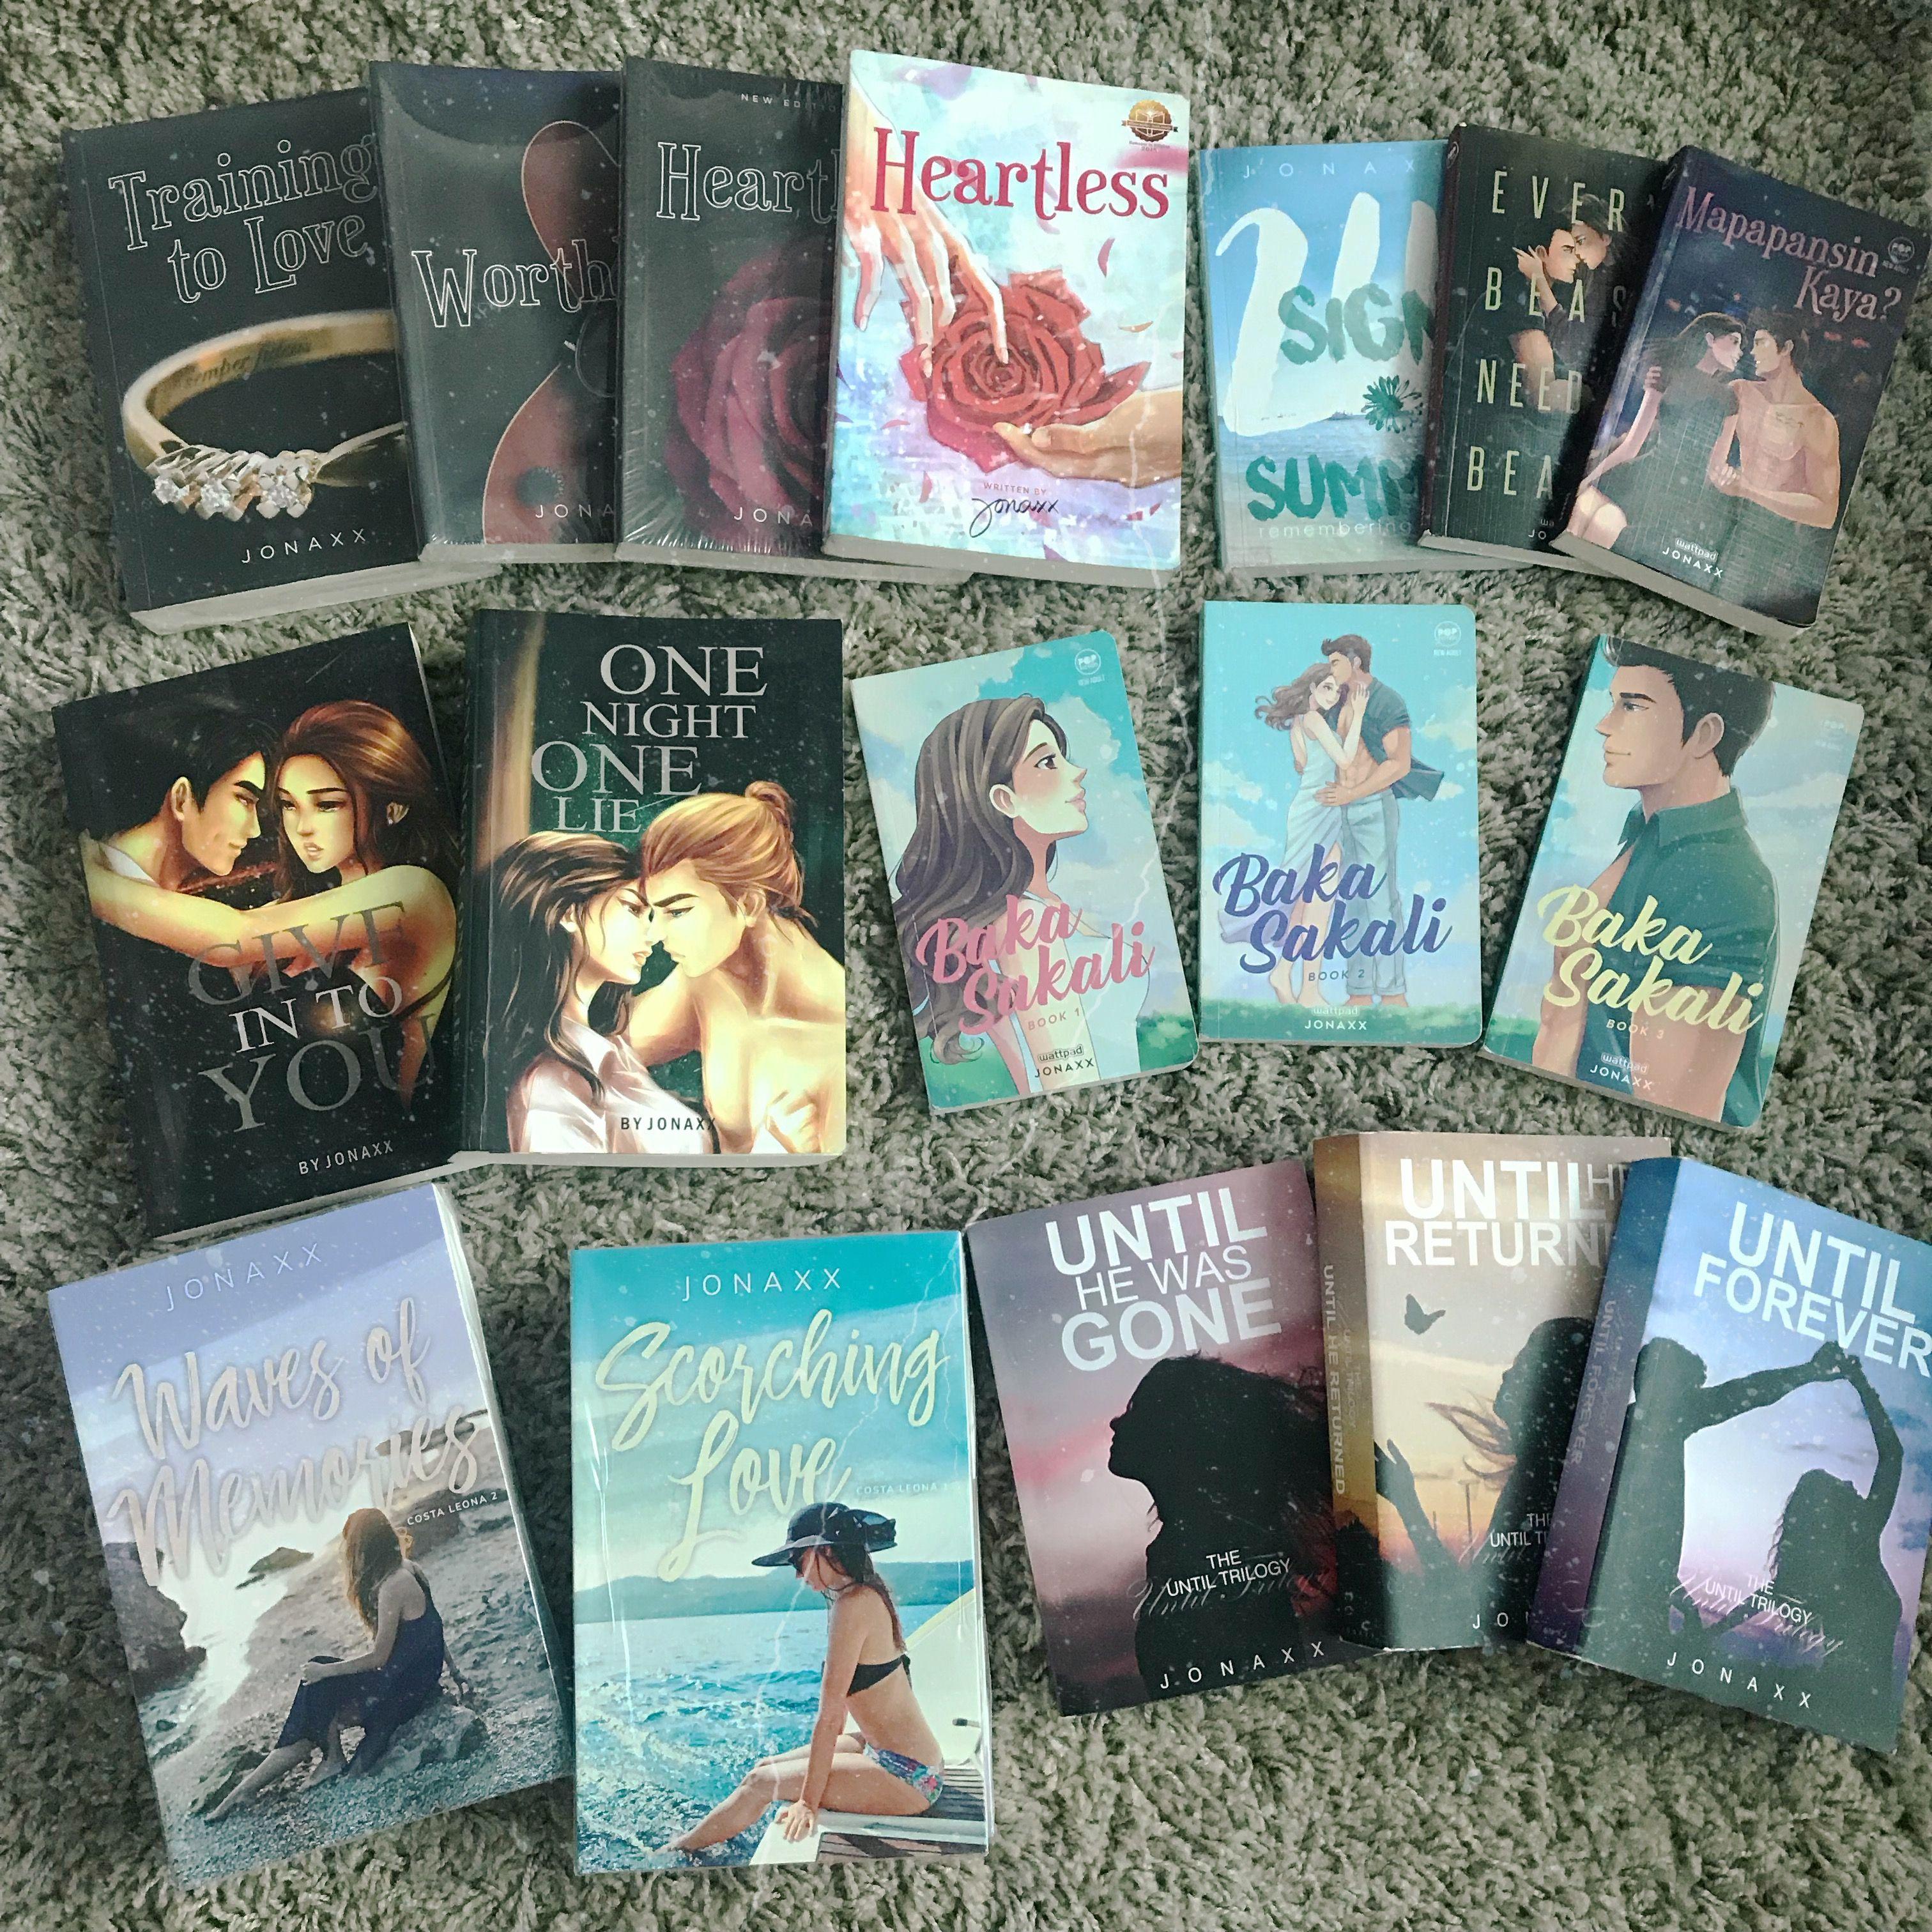 My Very Own Jonaxx Books Collection Updated Version Jonaxx Jonaxxstorieslover Jsl Jonaxxthing Jonaxxboys Jonaxxgirls Jonaxx Wattpad Books Jonaxx Boys